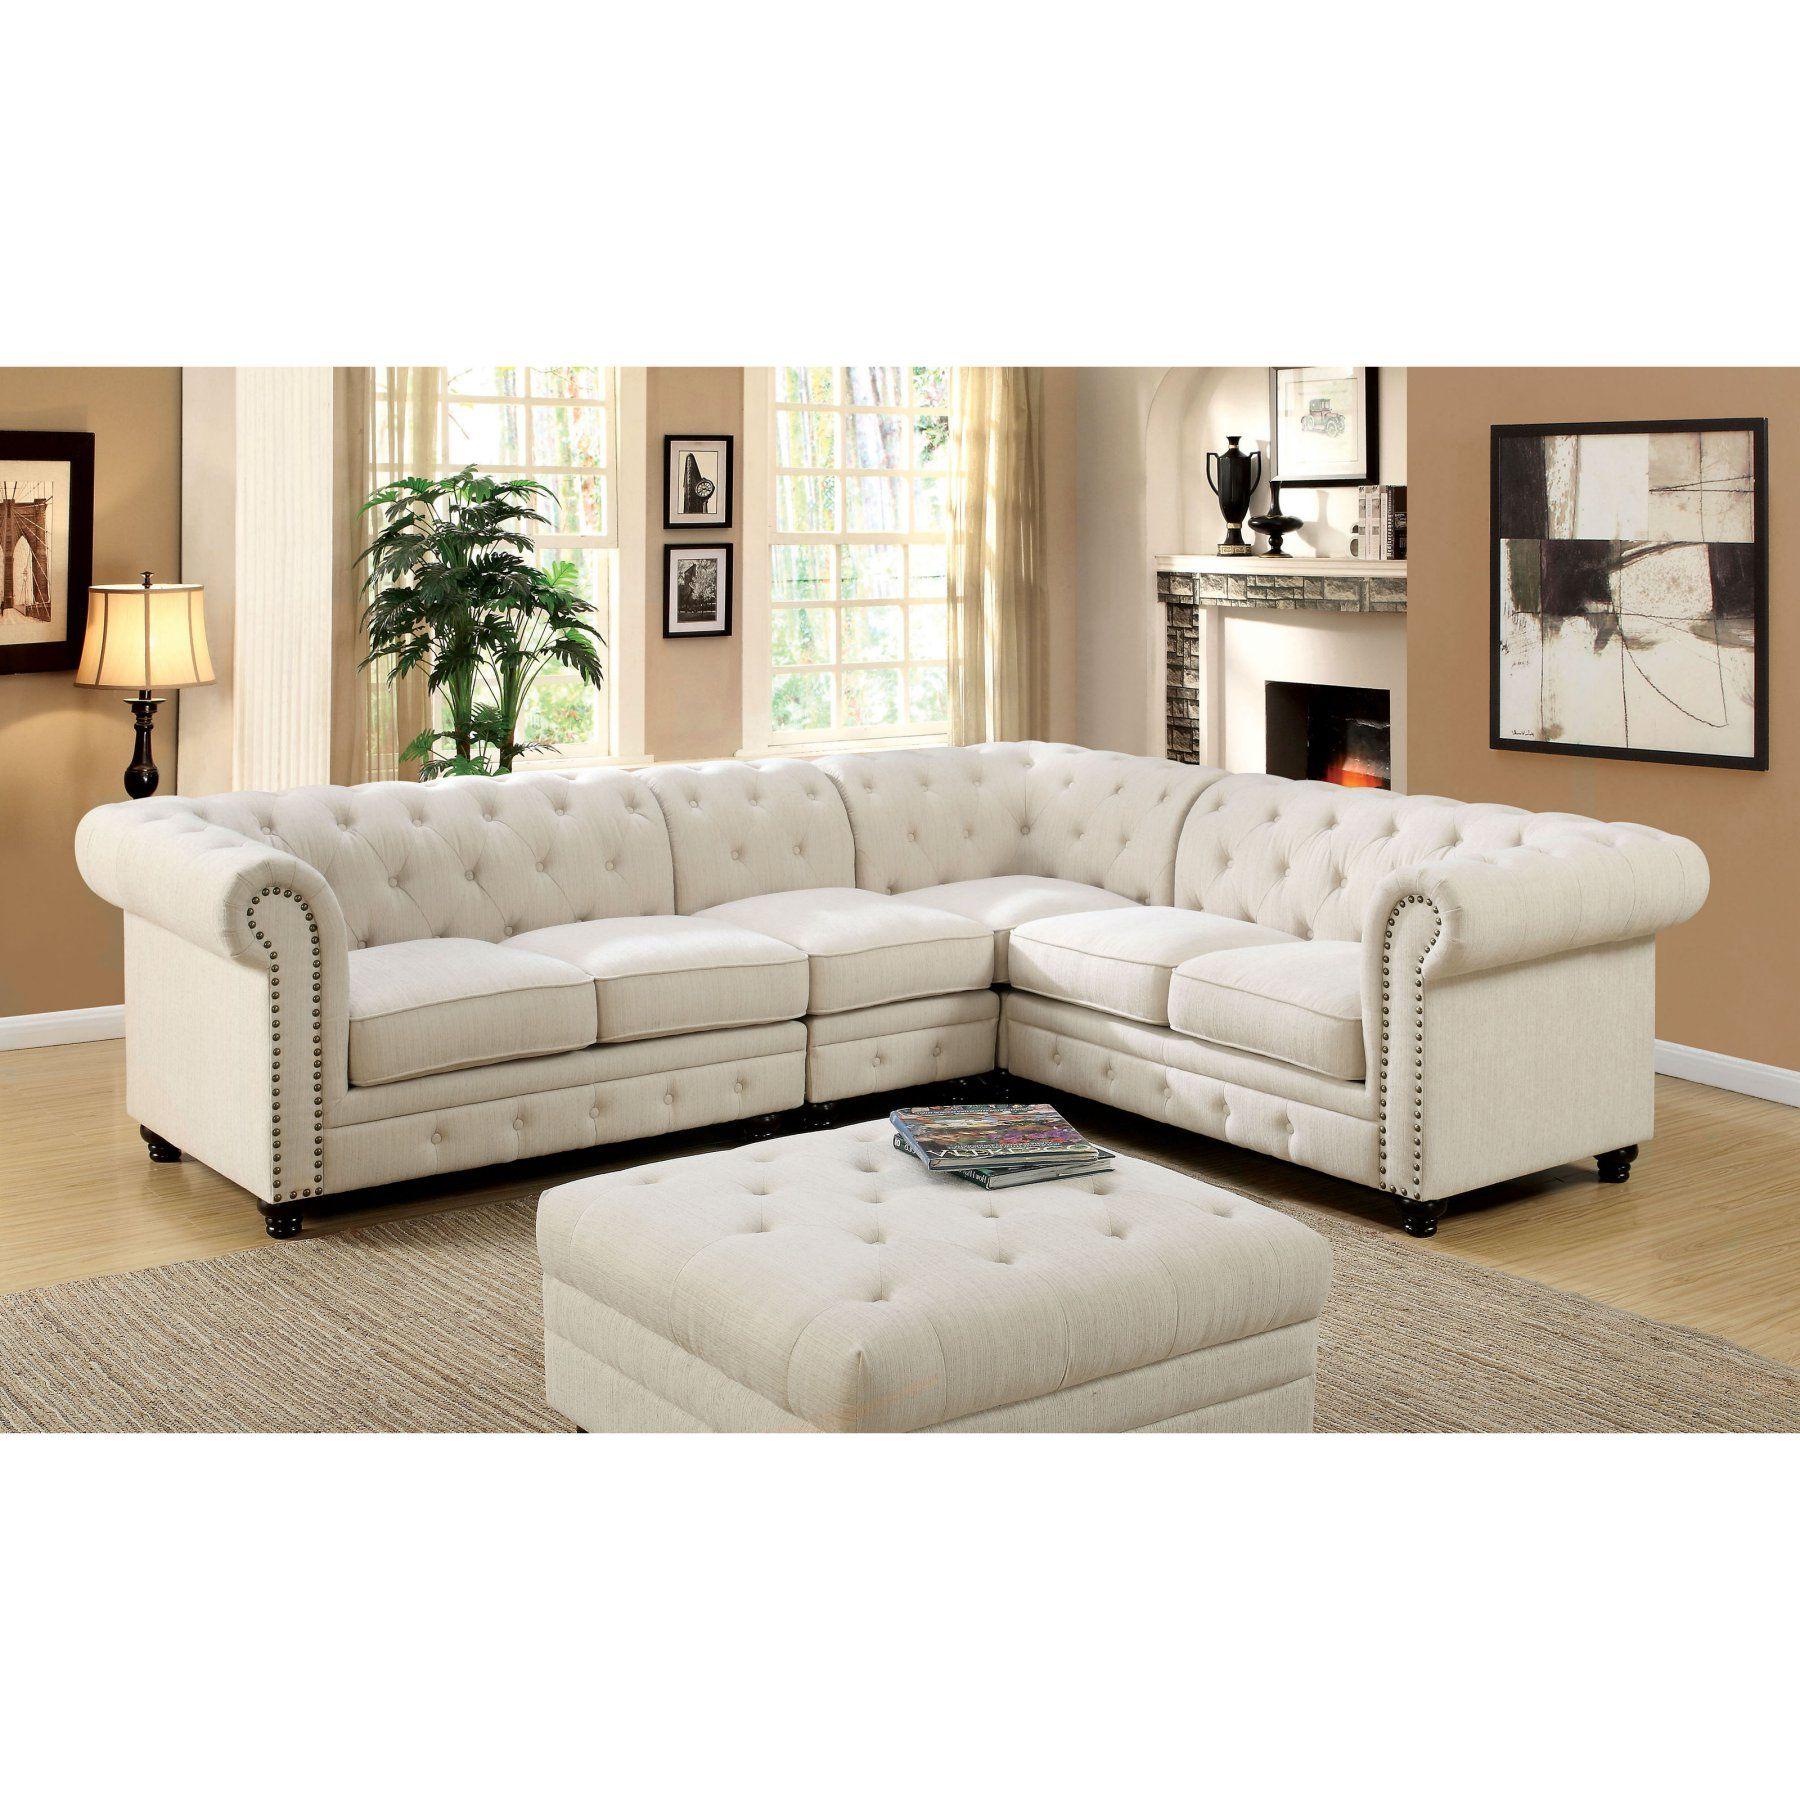 Furniture Of America Starken Ii Upholstered Sectional Sofa